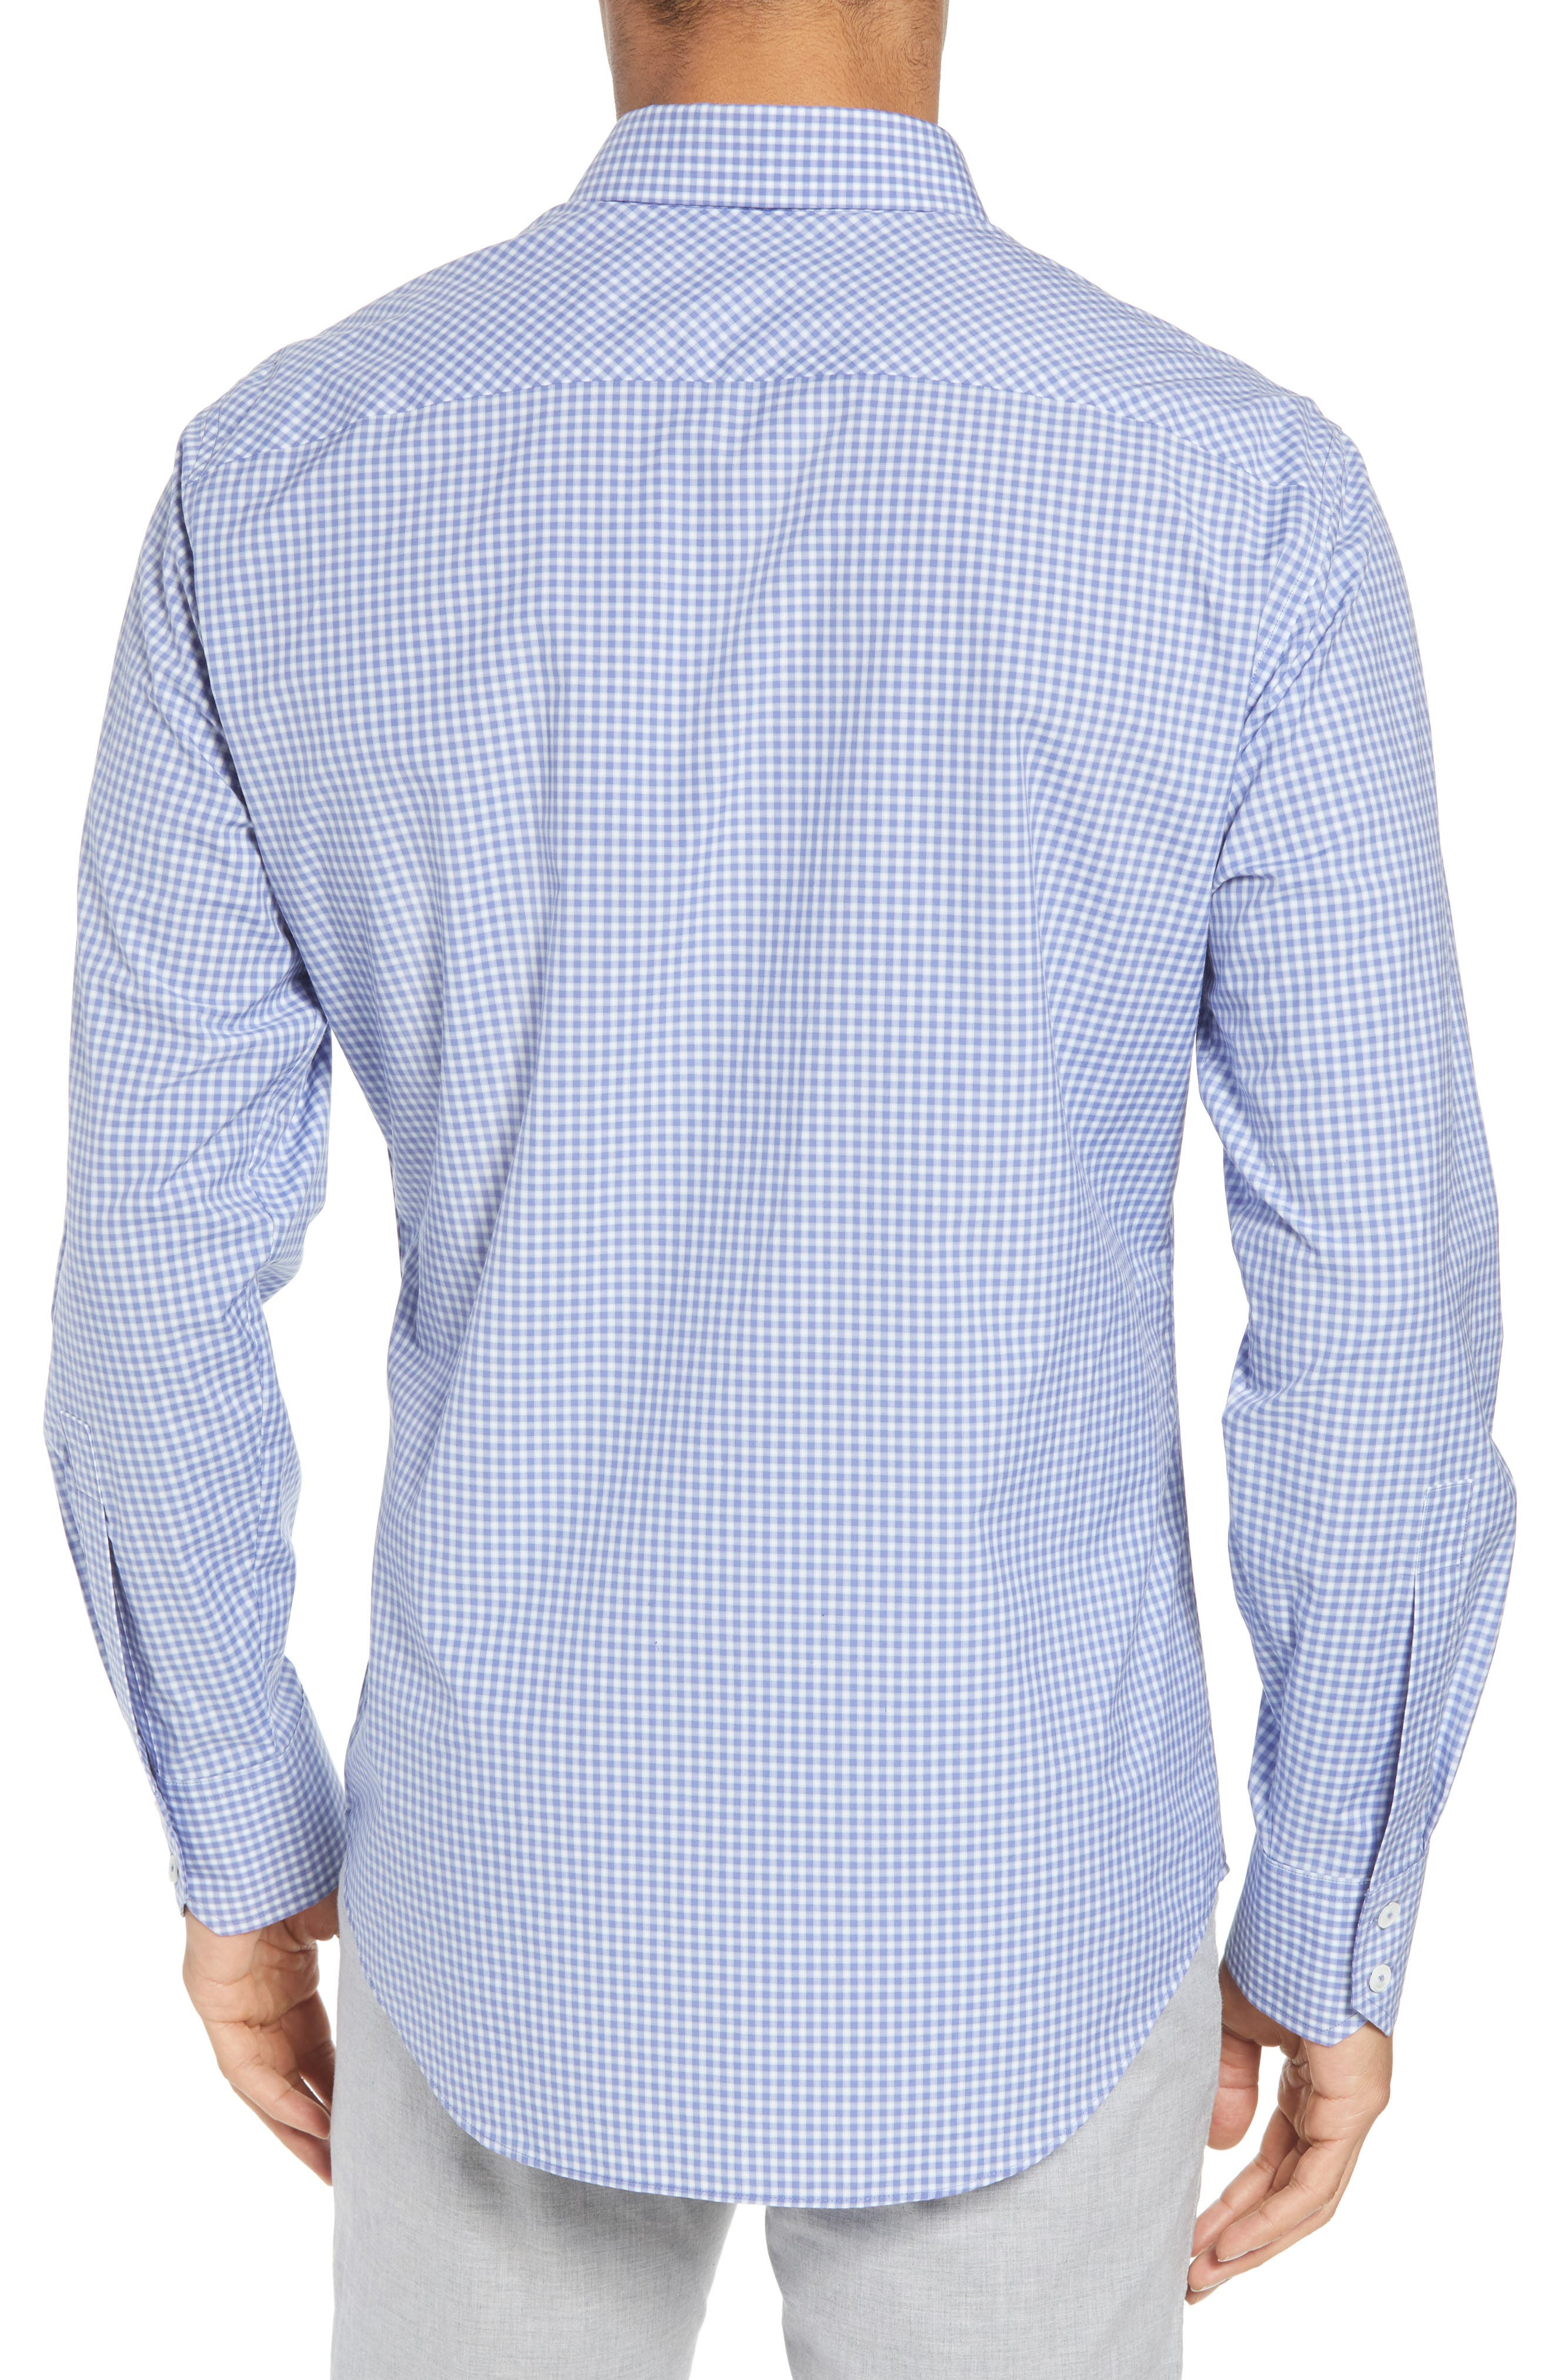 Winston Regular Fit Sport Shirt,                             Alternate thumbnail 2, color,                             422